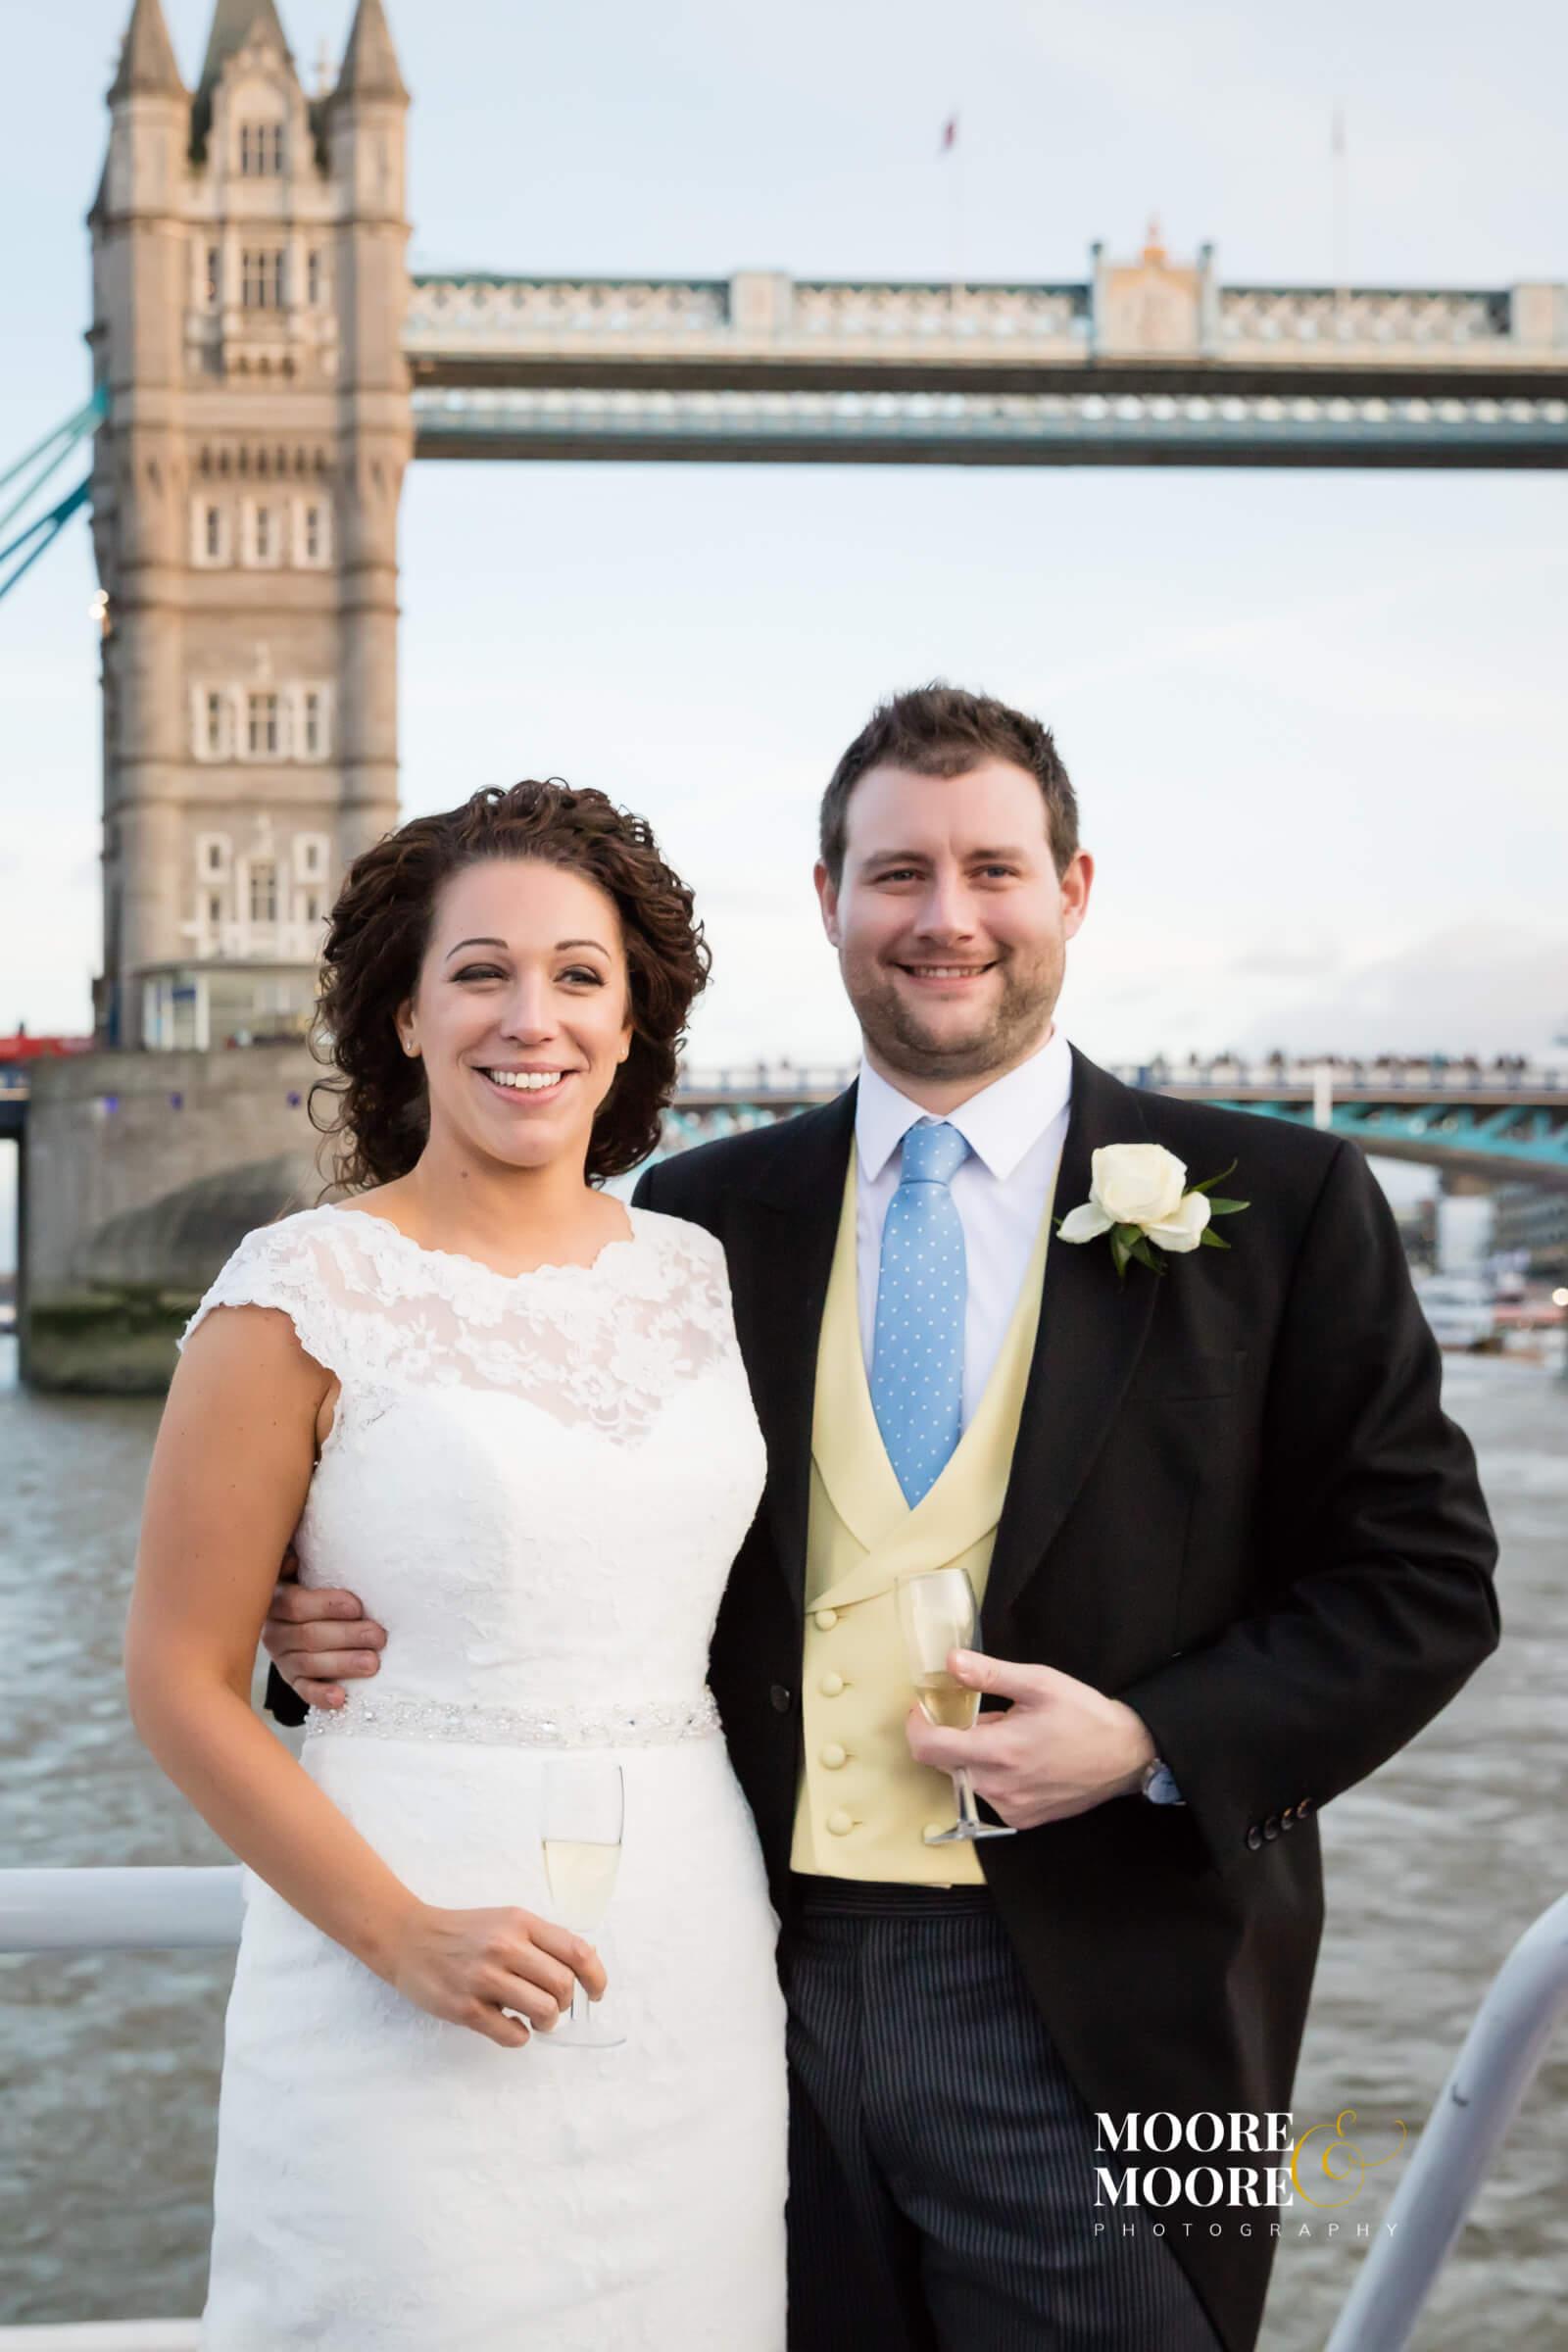 Bride and groom by Tower Bridge wedding photos by Moore&Moore Photography, Wedding Photographer Hampshire